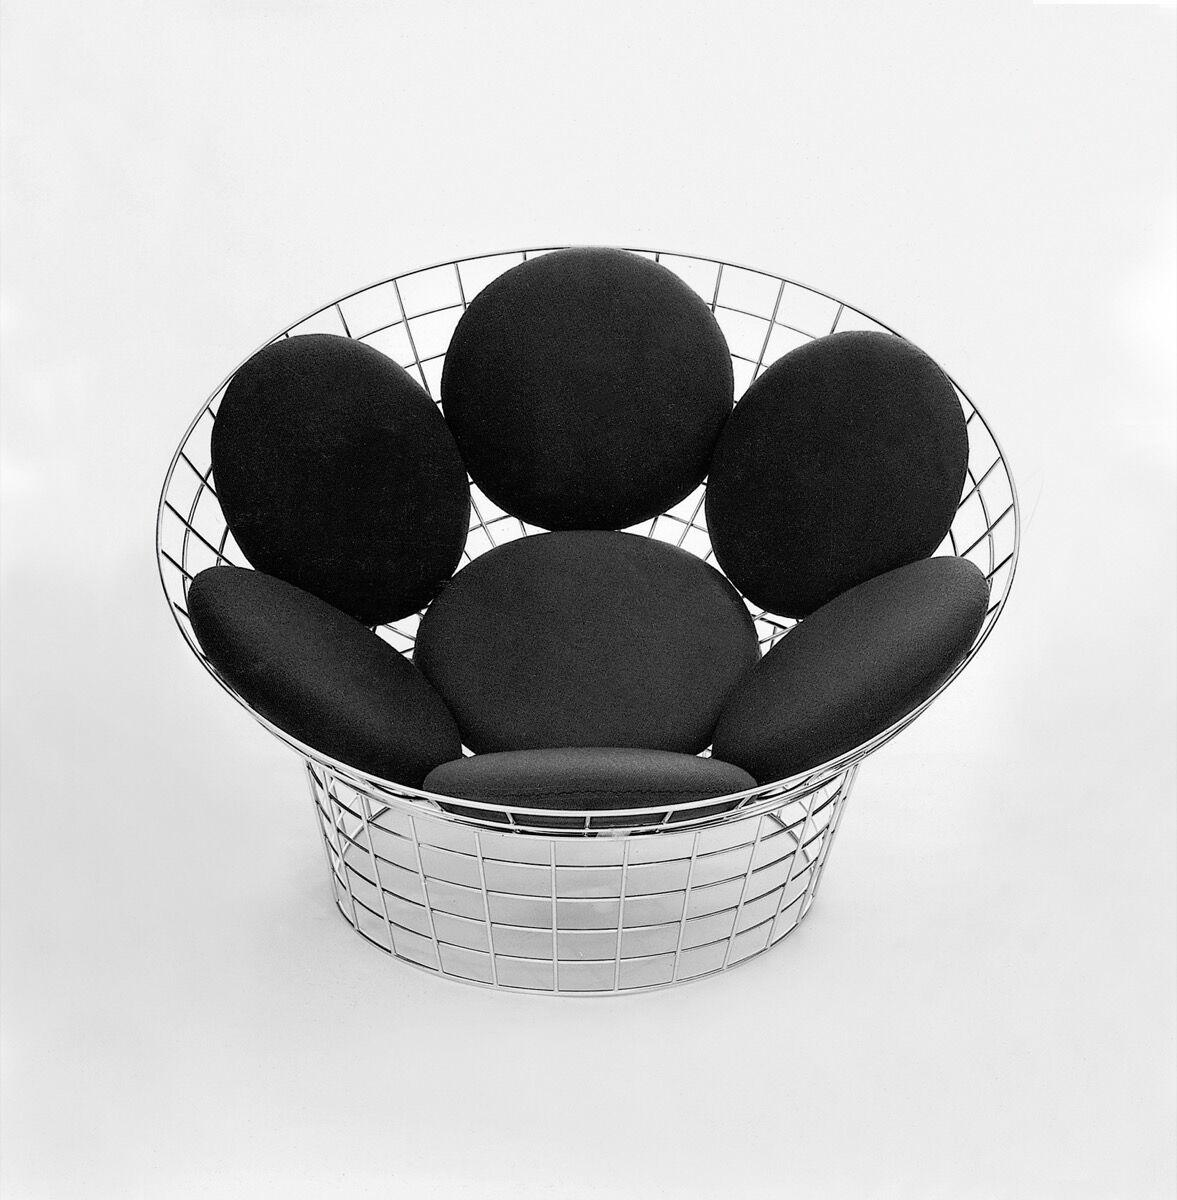 Verner Panton, The Peacock chair, 1960. © Panton Design, Basel. Courtesy of Phaidon.